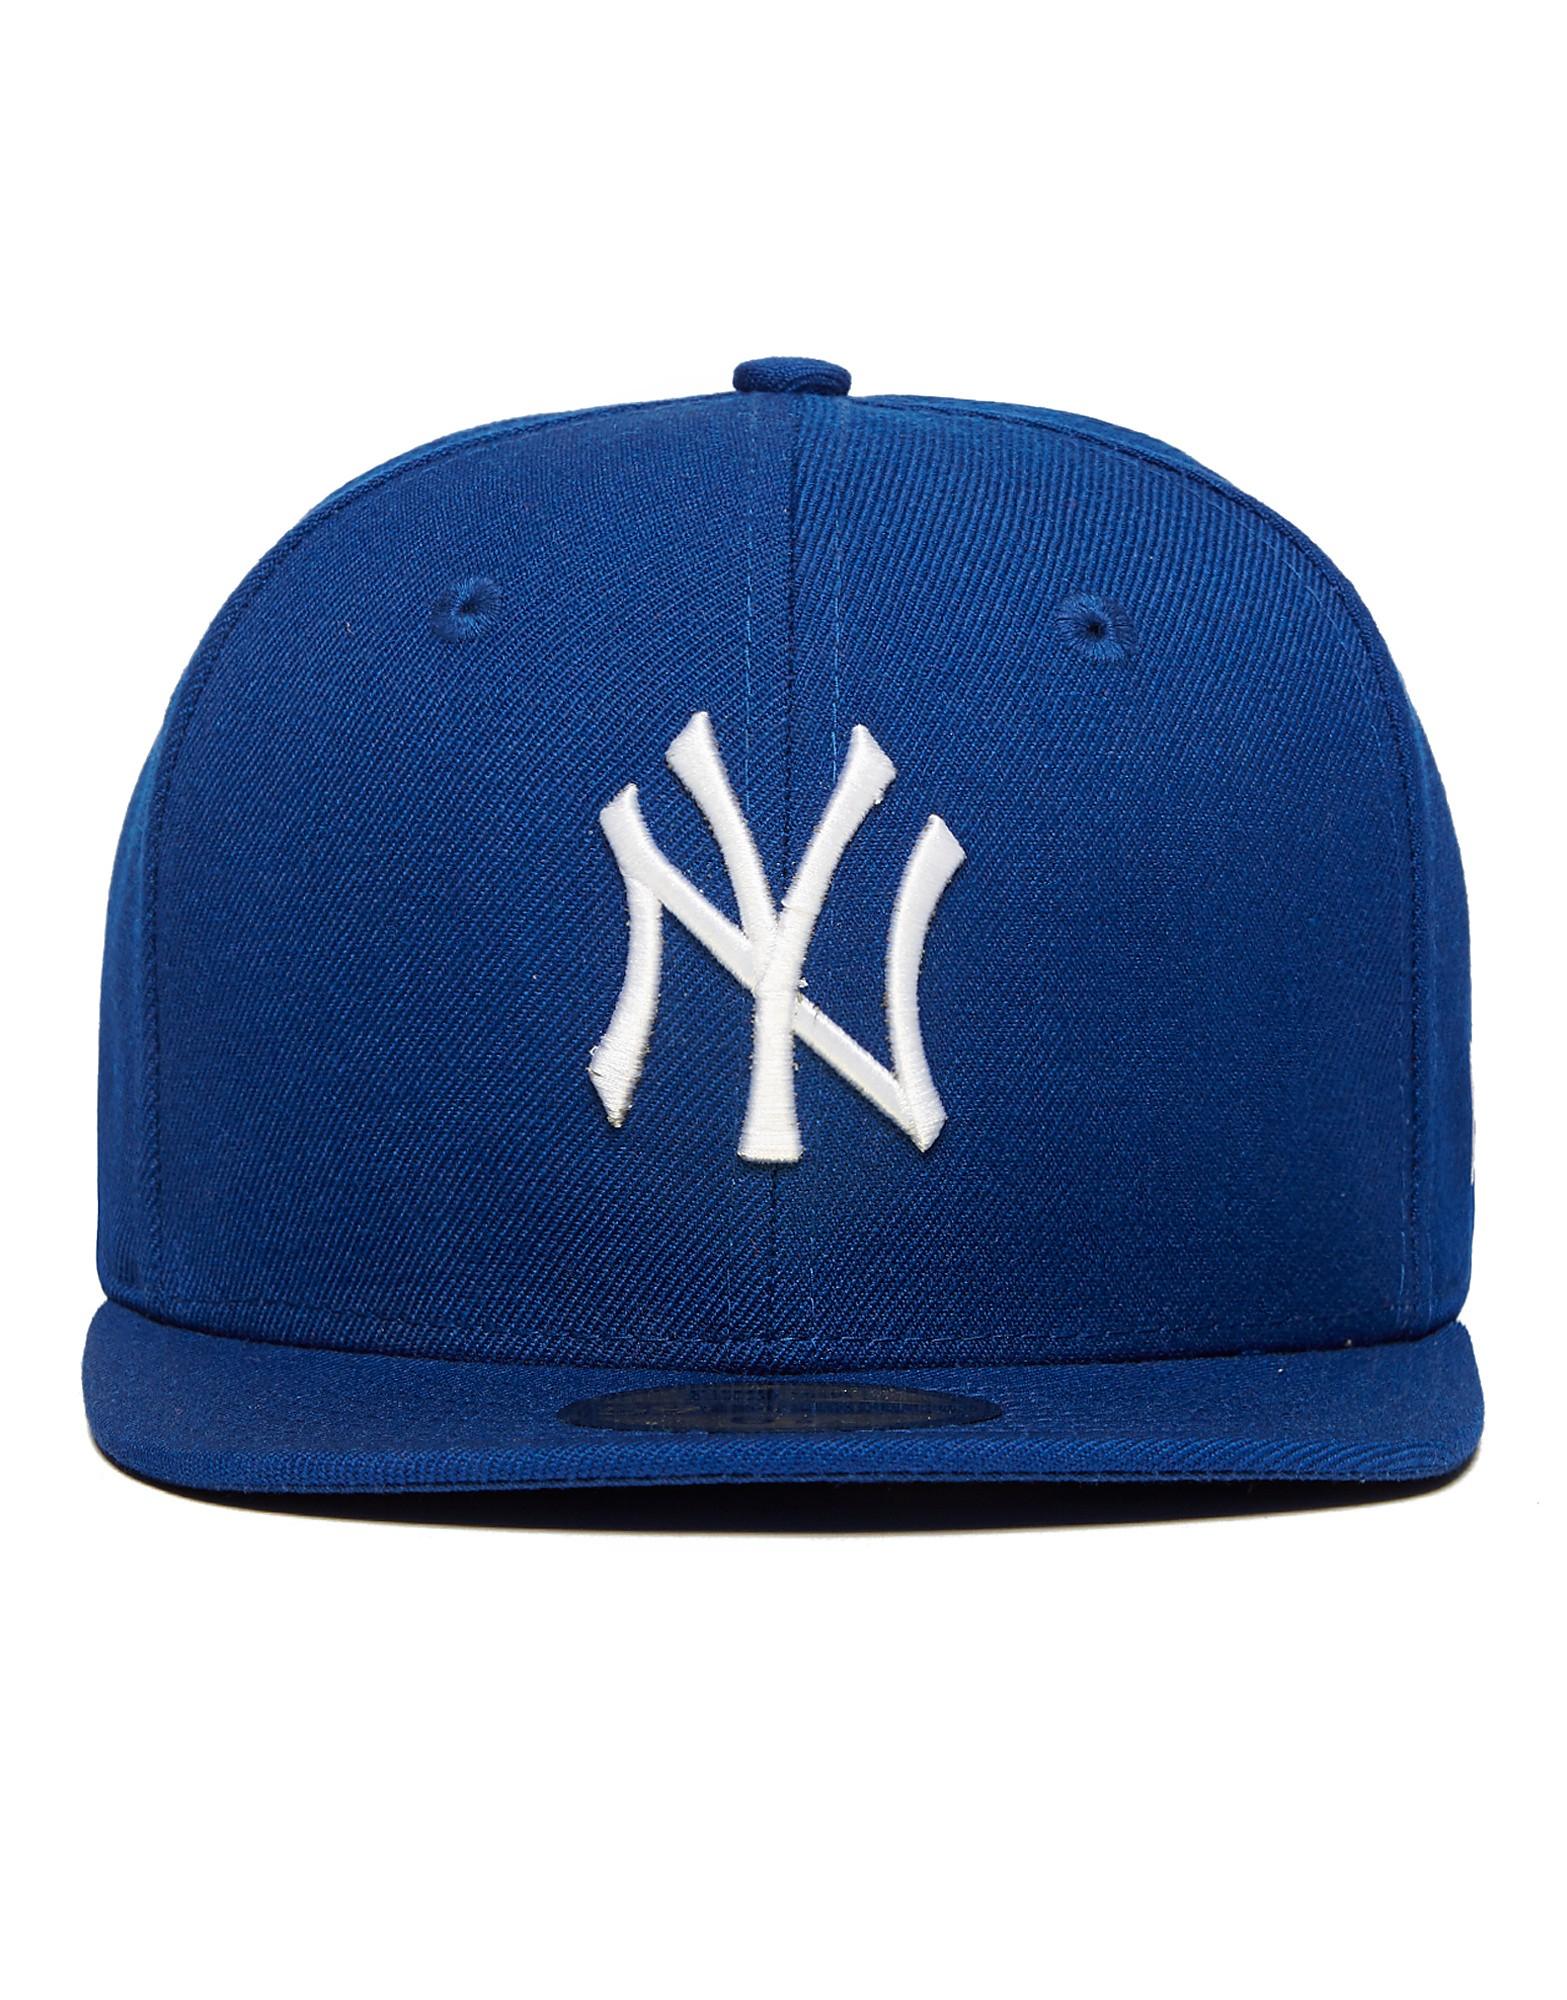 New Era gorra MLB New York Yankees 59FIFTY Fitted